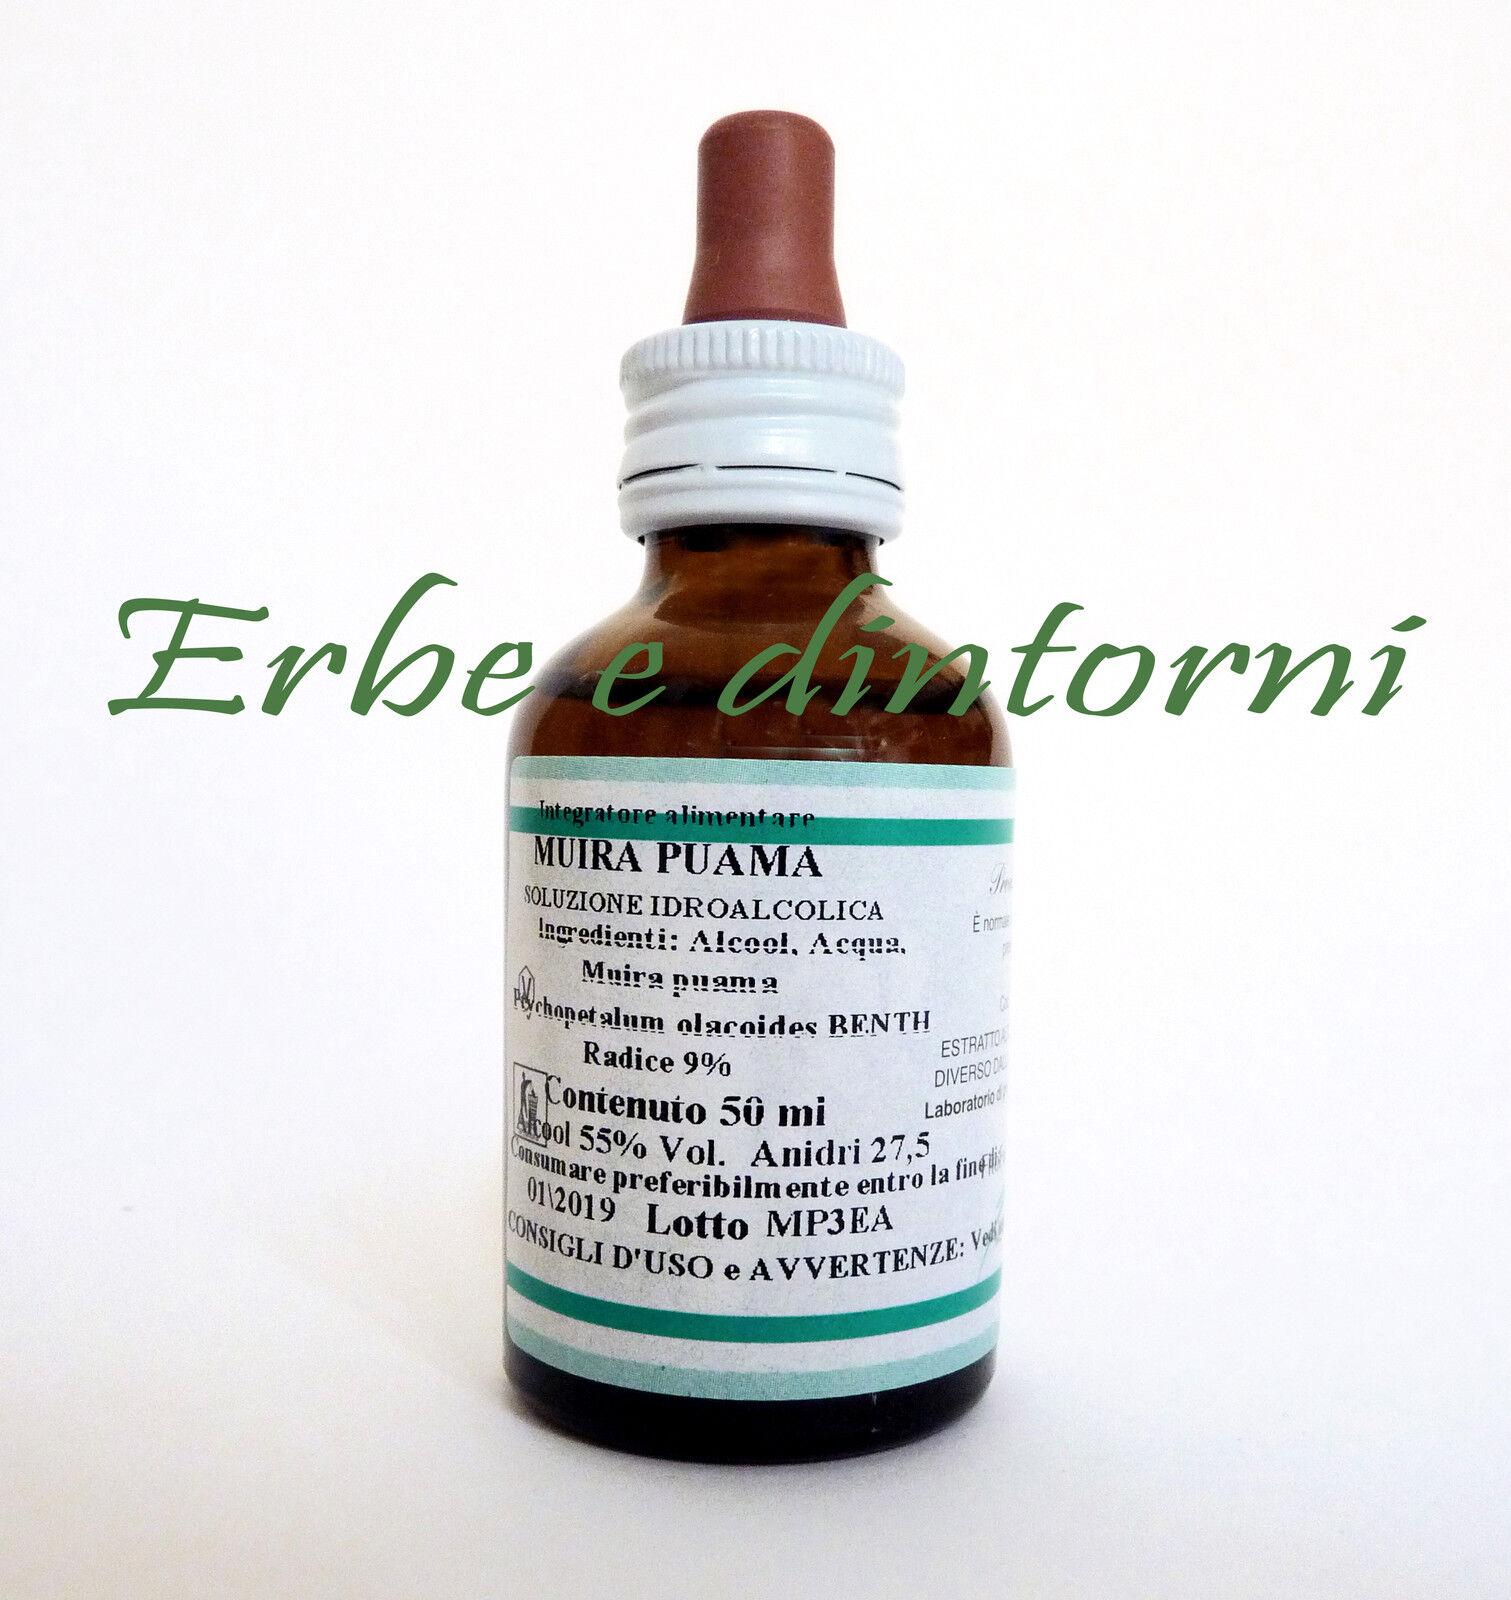 MUIRA PUAMA Ptychopetalum olacoides Estratto idroalcolico 50 ml. Afrodisiaco